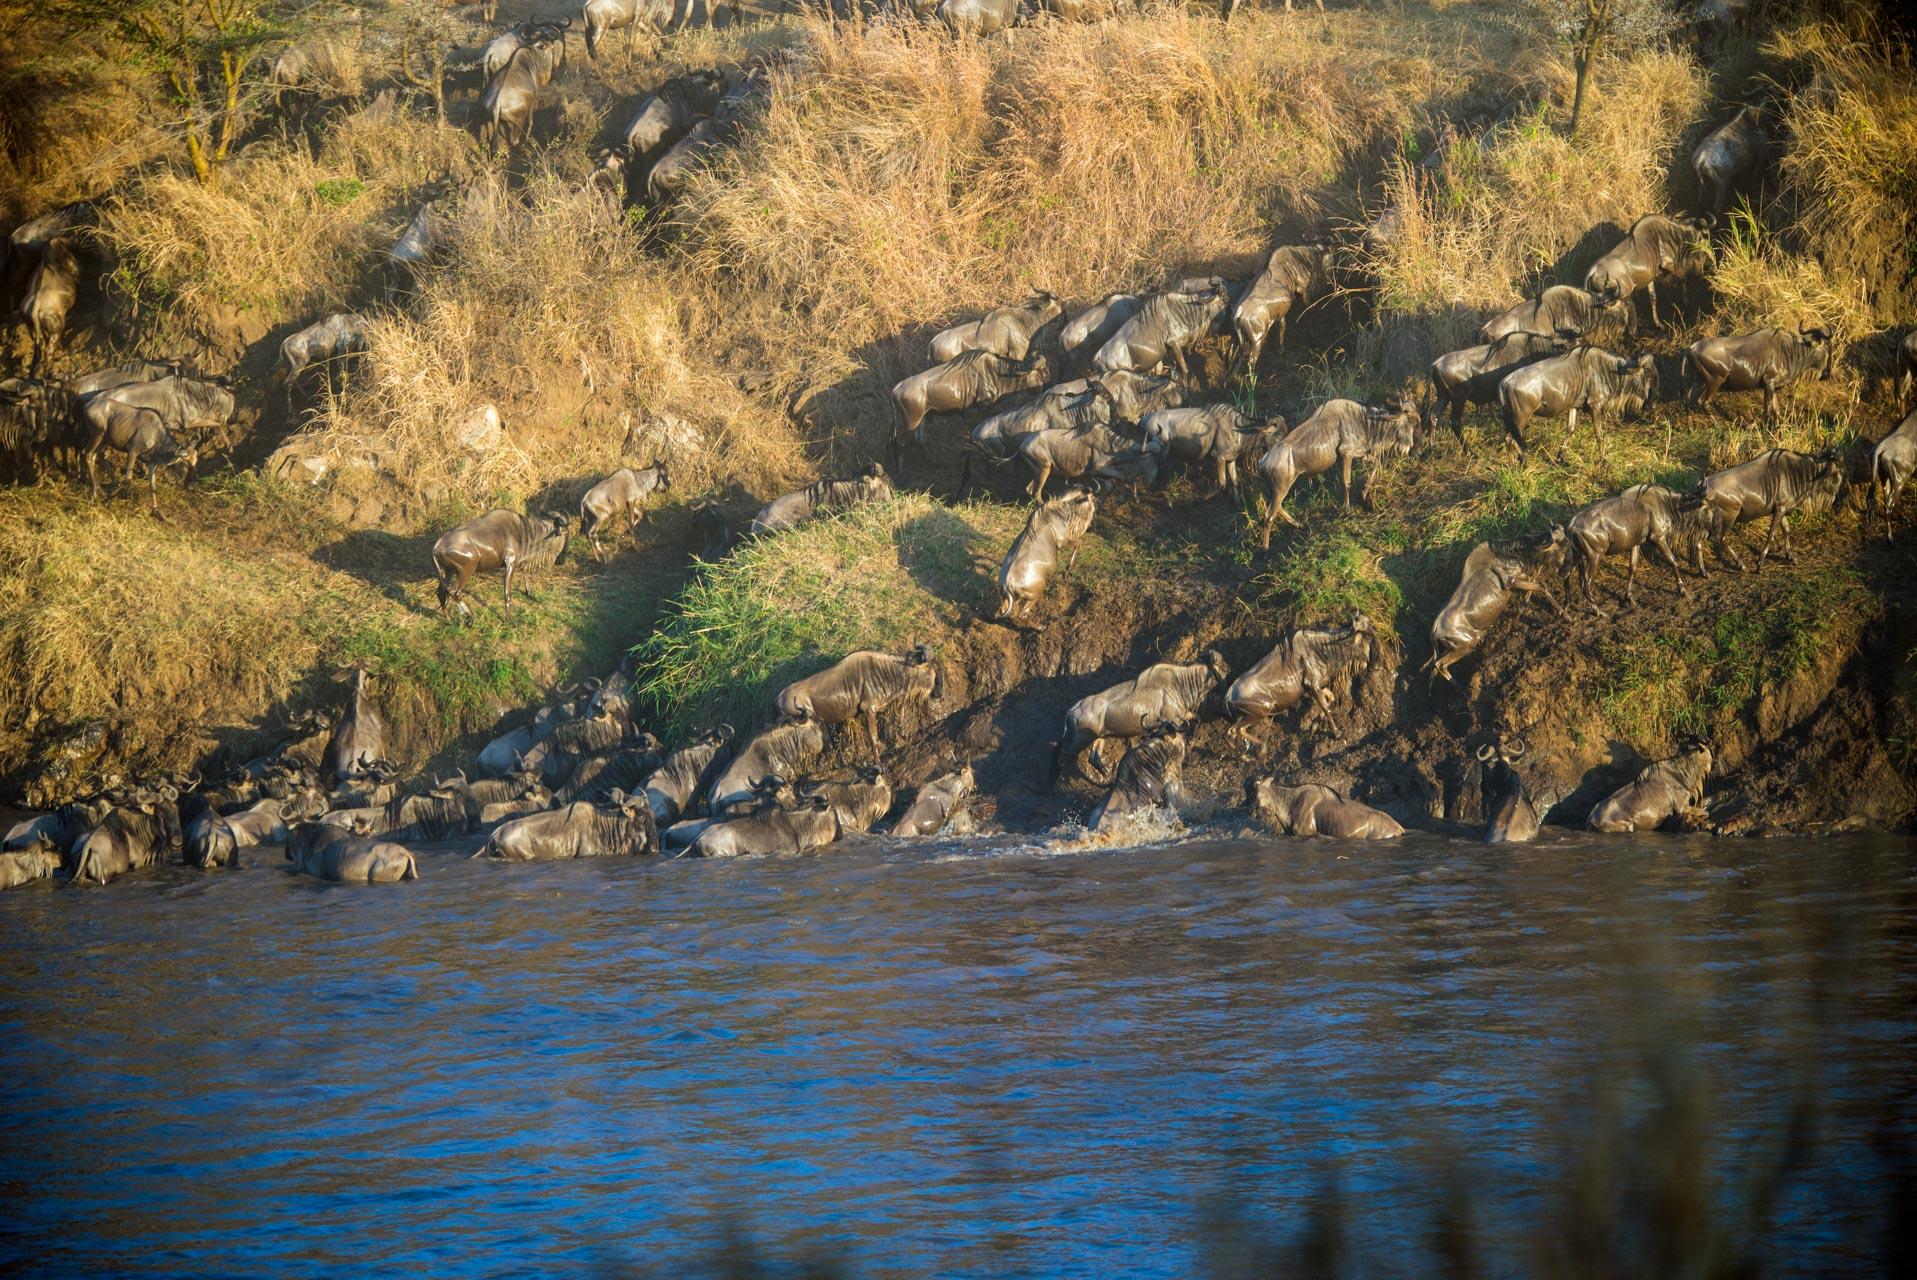 6 Days Kogatende Migration Safari